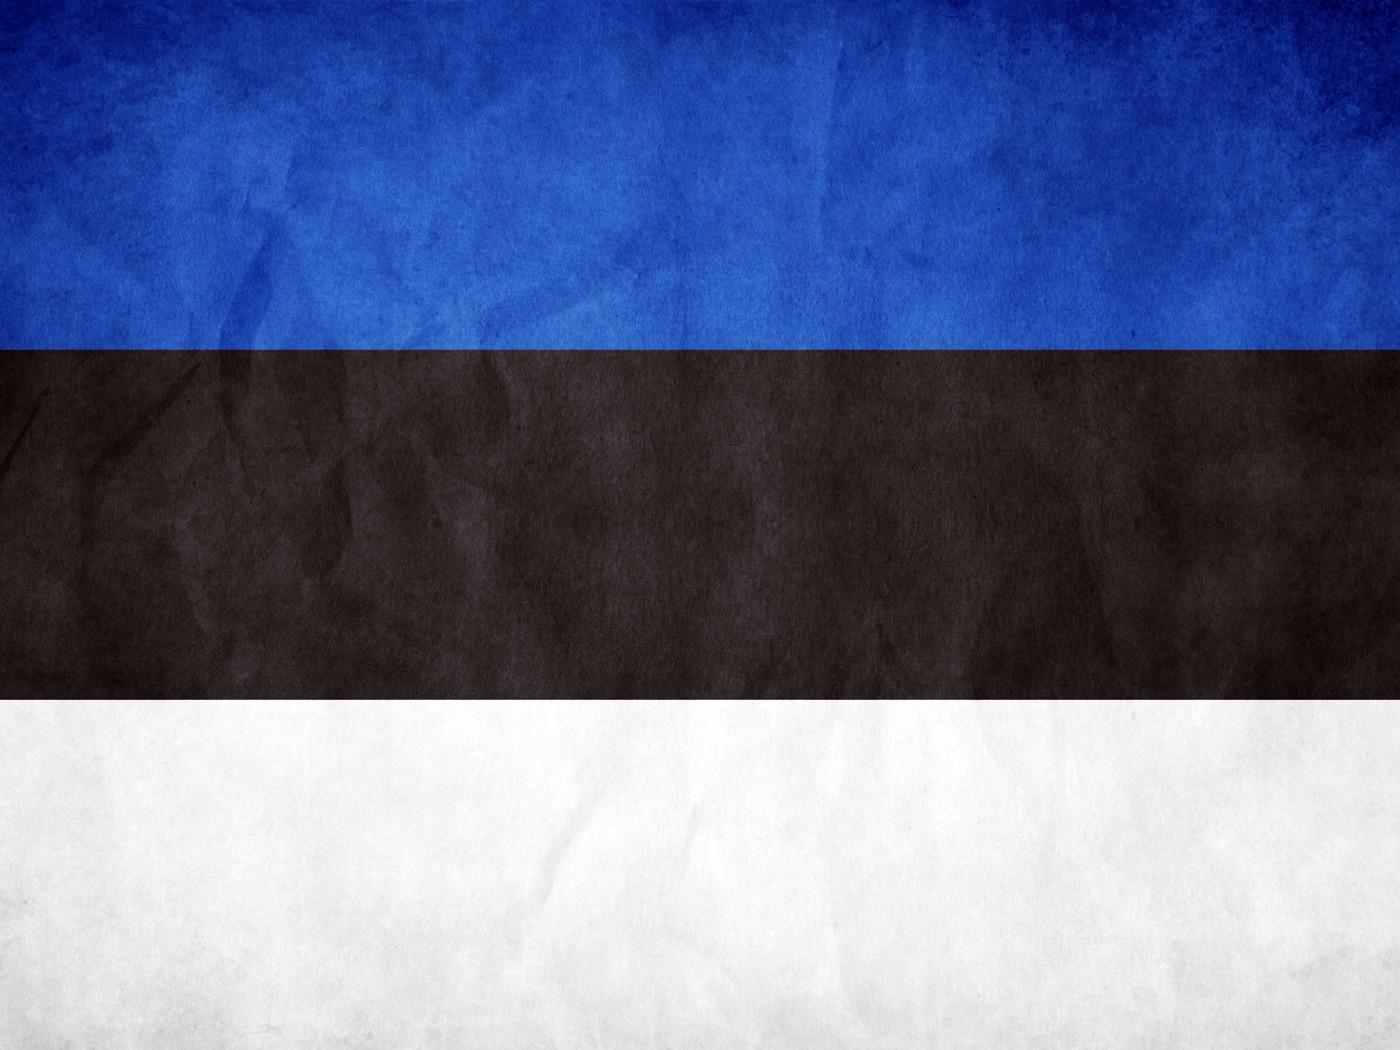 Estonia flag wallpaper 9784 PC en 1400x1050